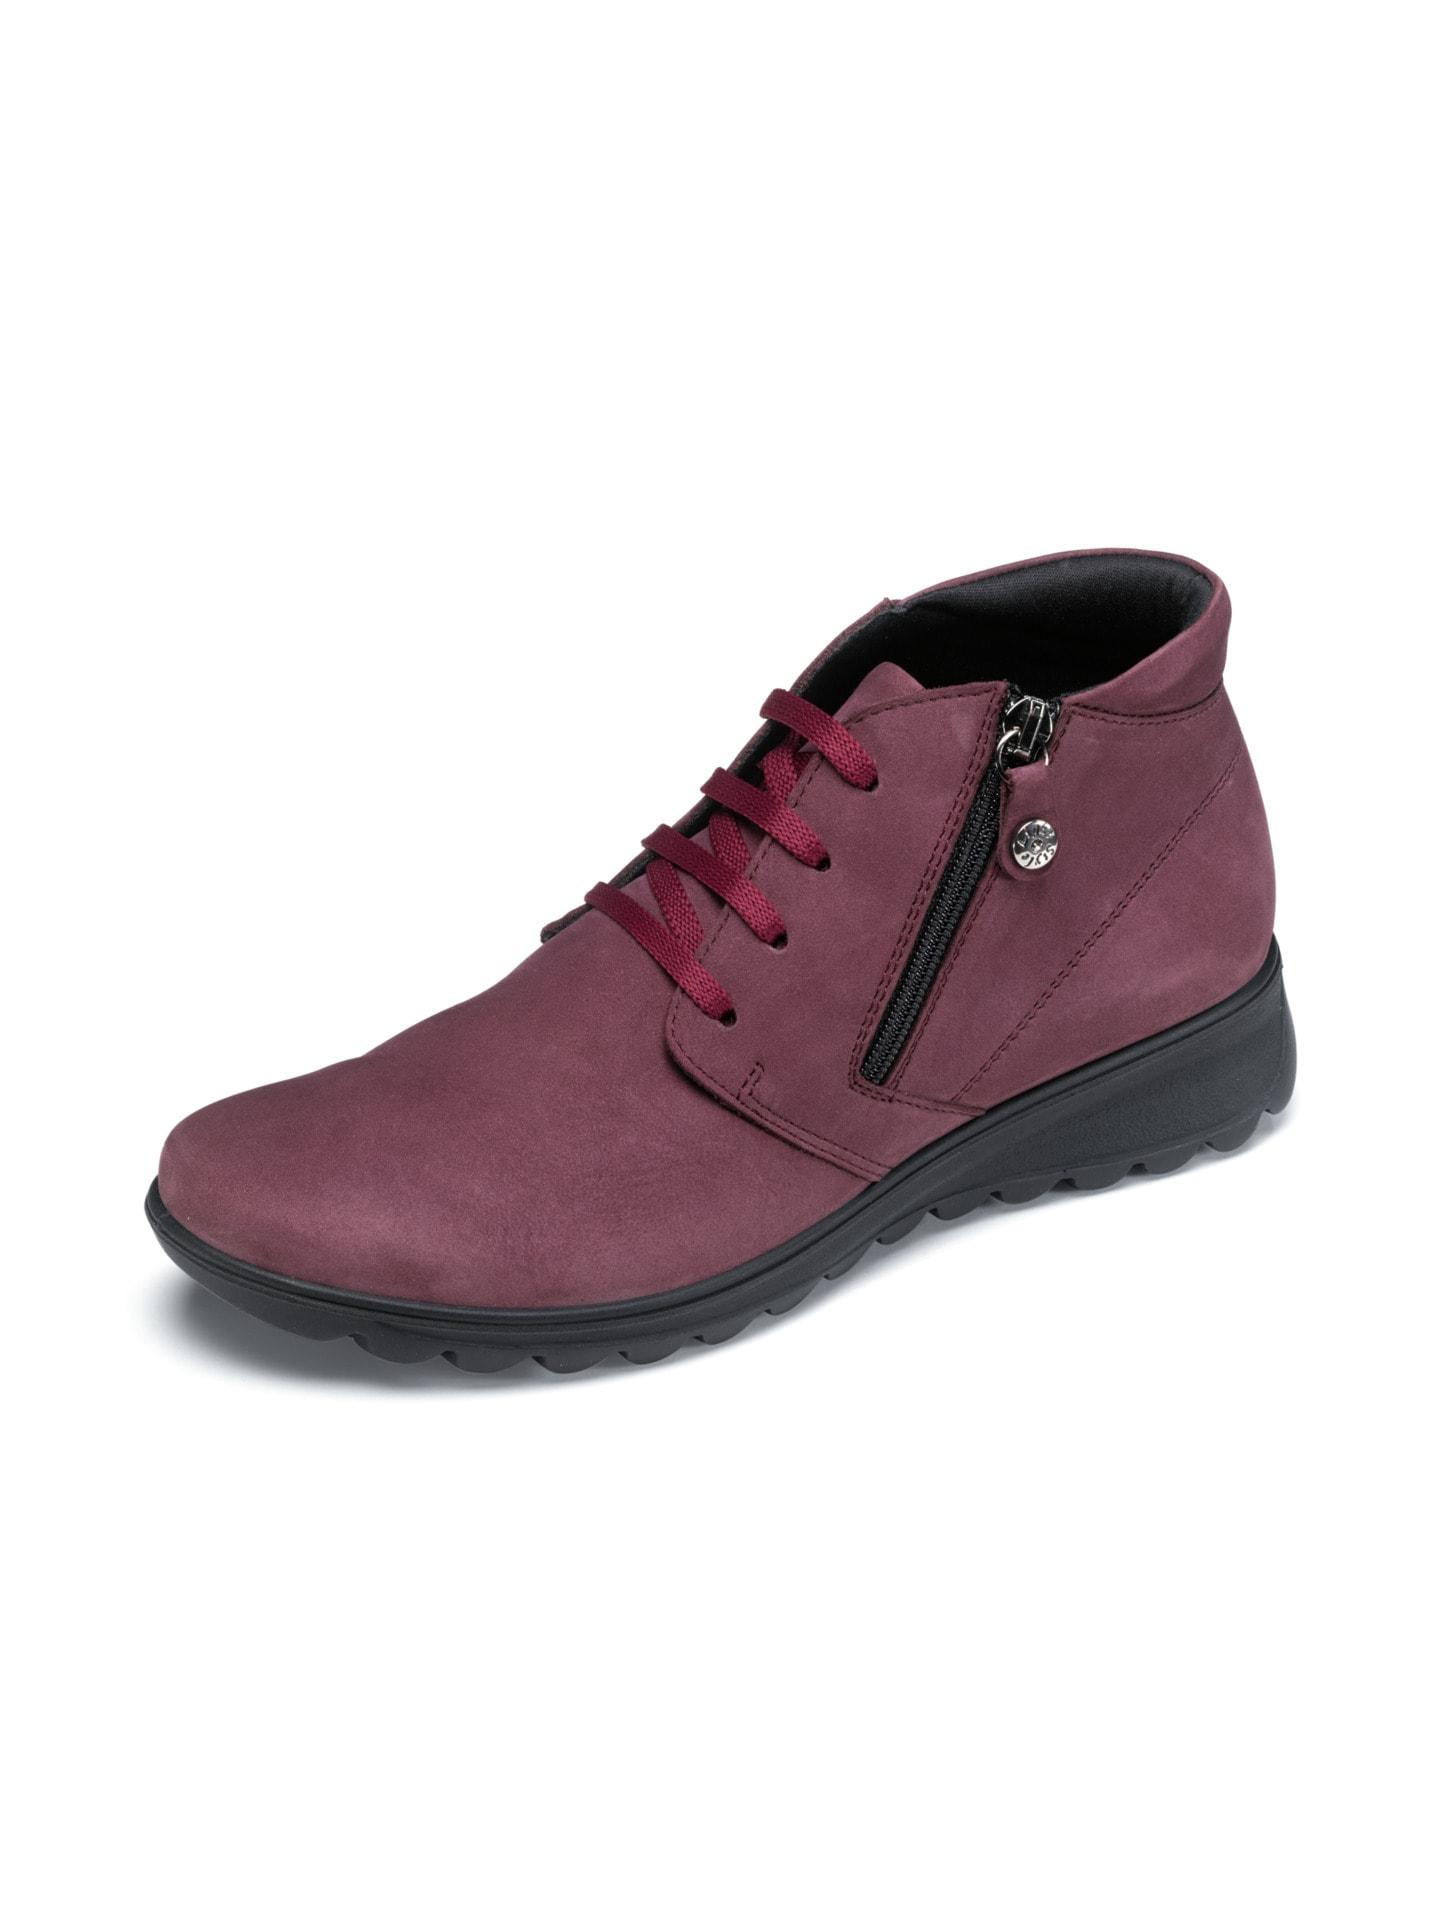 Avena Damen Luftkissen-Nubuk-Boots Ultraleicht Rot 45-6986-4